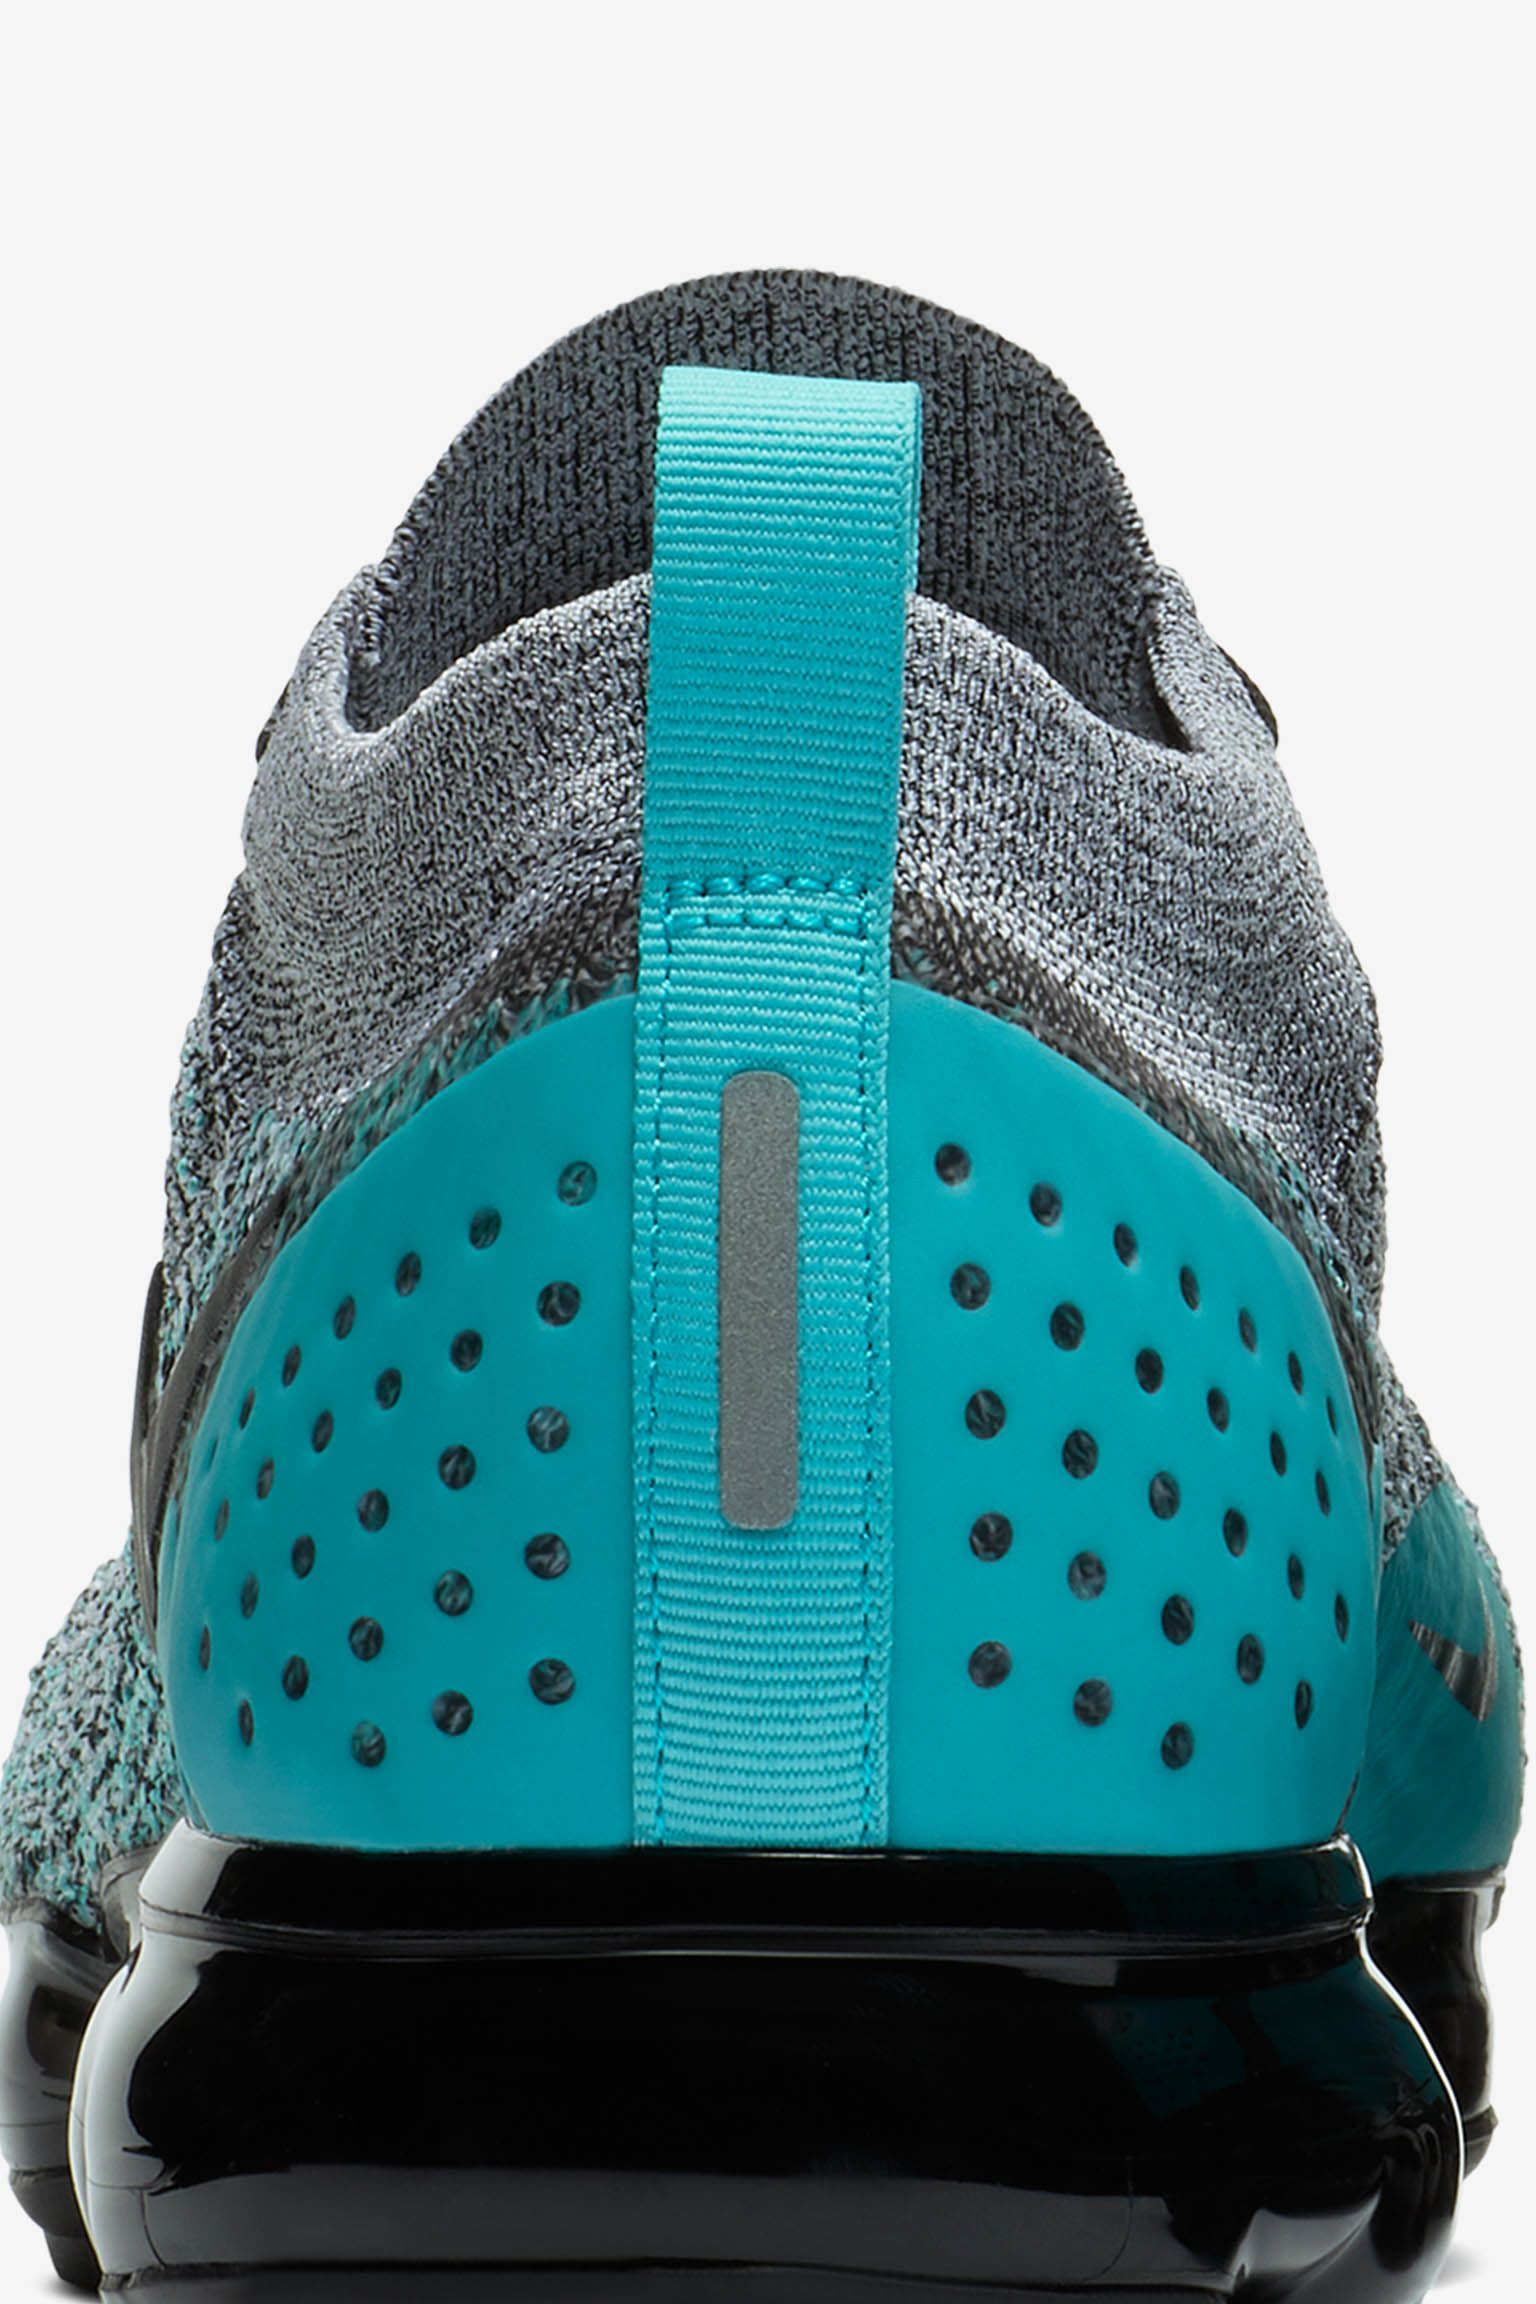 Nike Air Vapormax Flyknit 2 'Dusty Cactus & Hyper Jade' Release Date